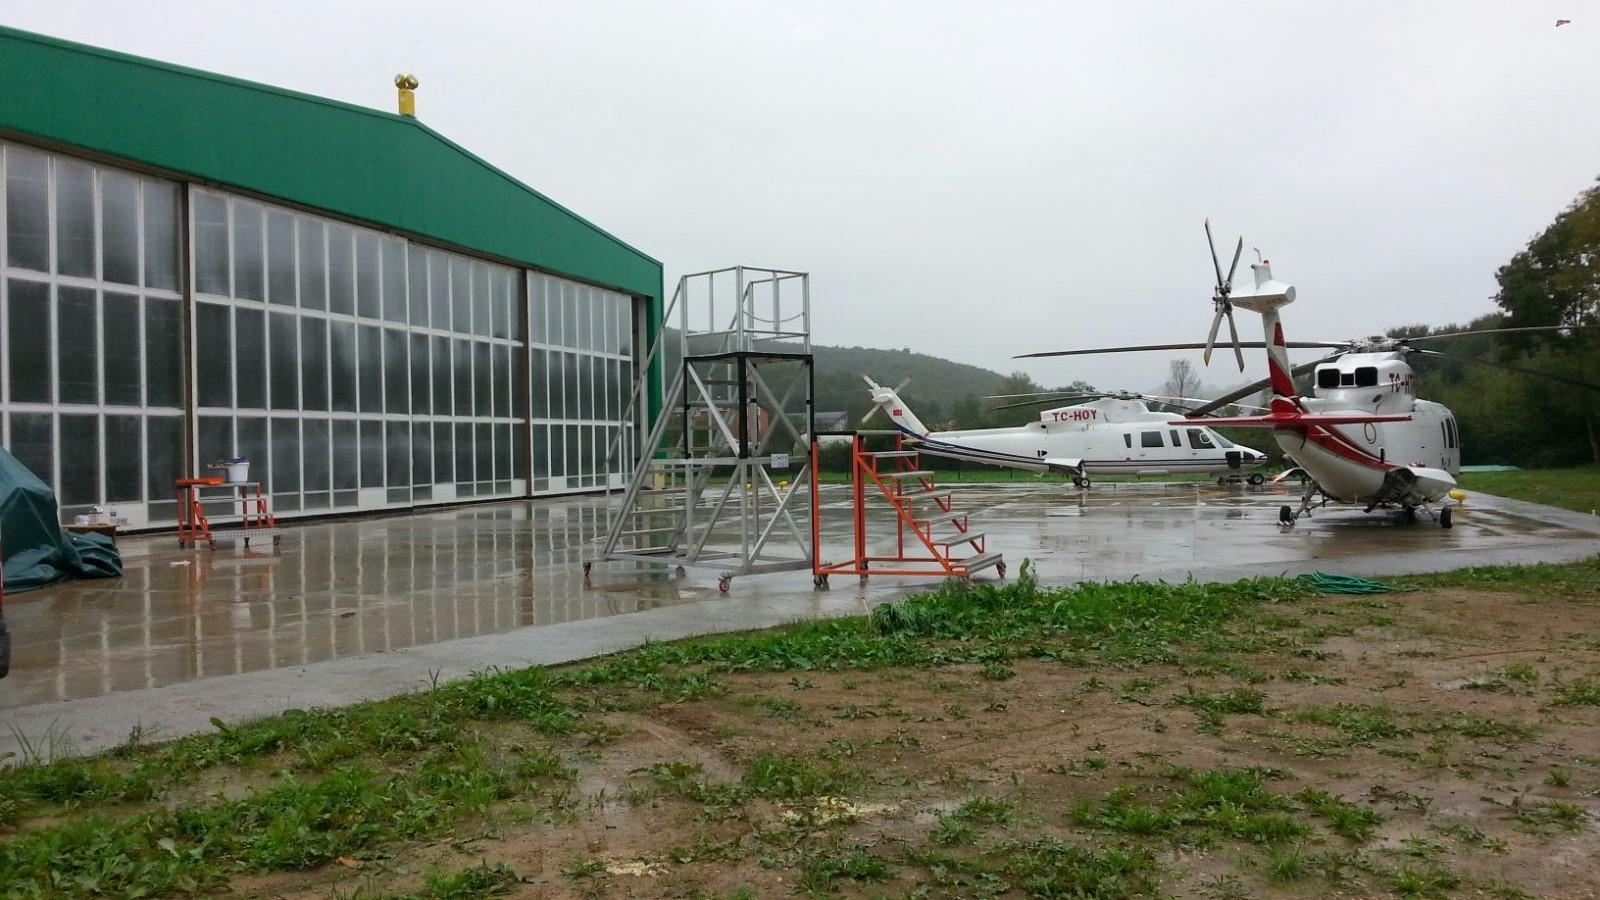 Saklıport Hangar